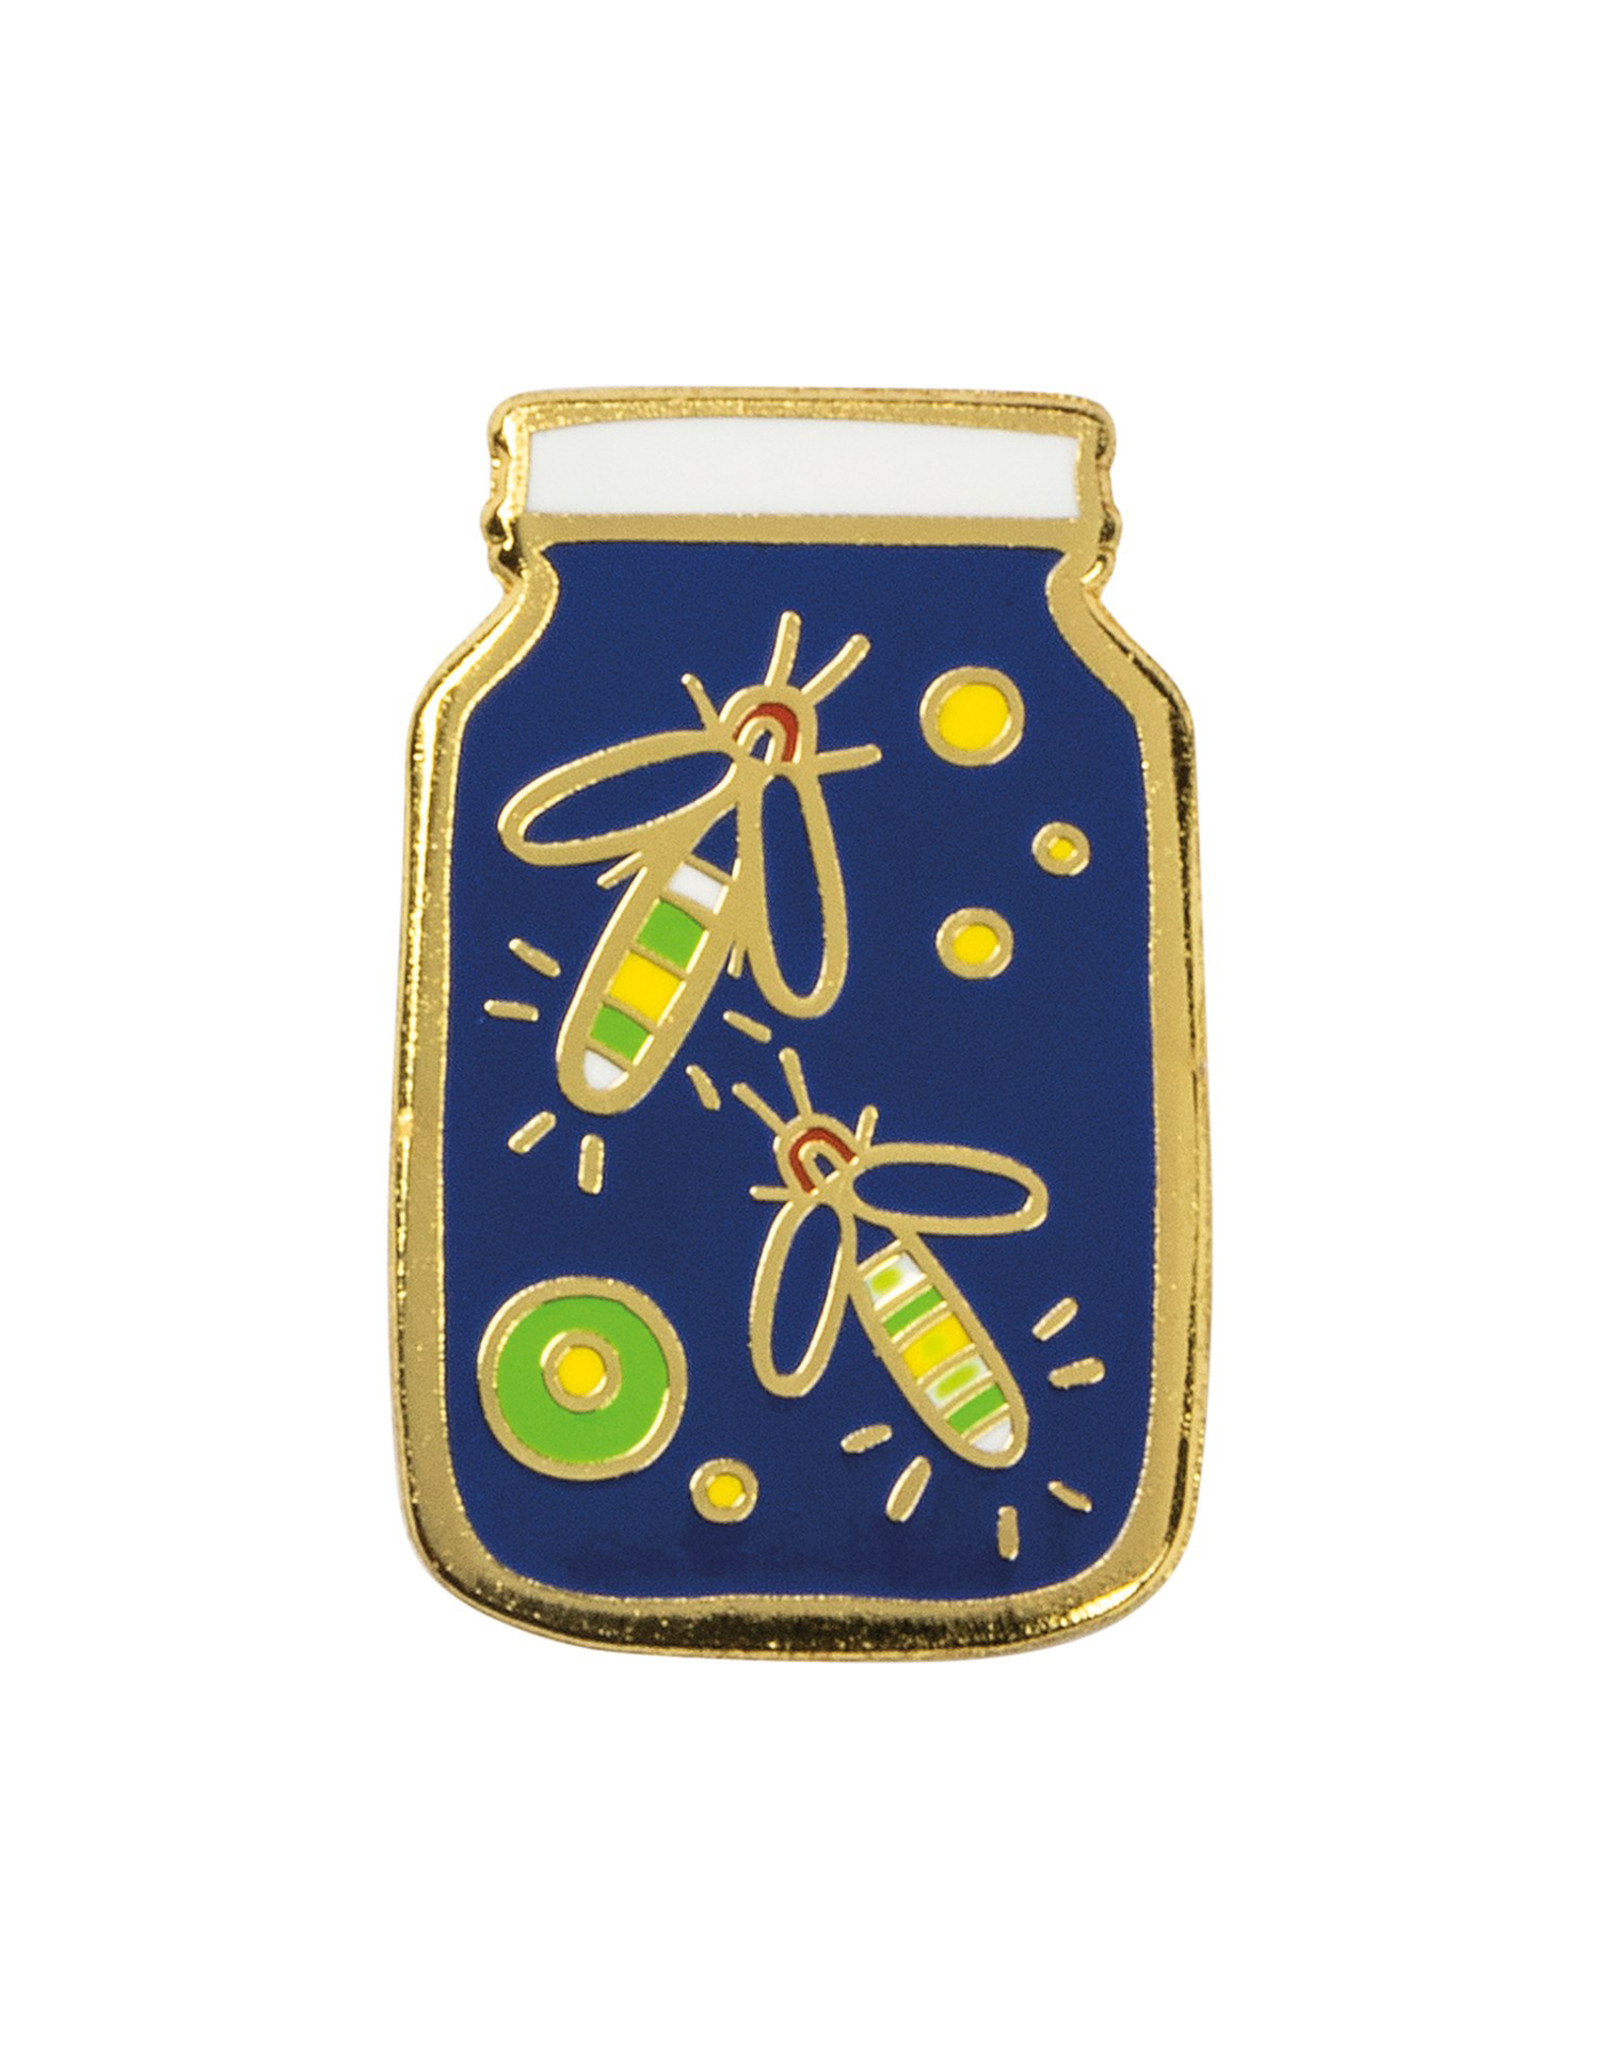 LOL Made You Smile Fireflies Enamel Pin